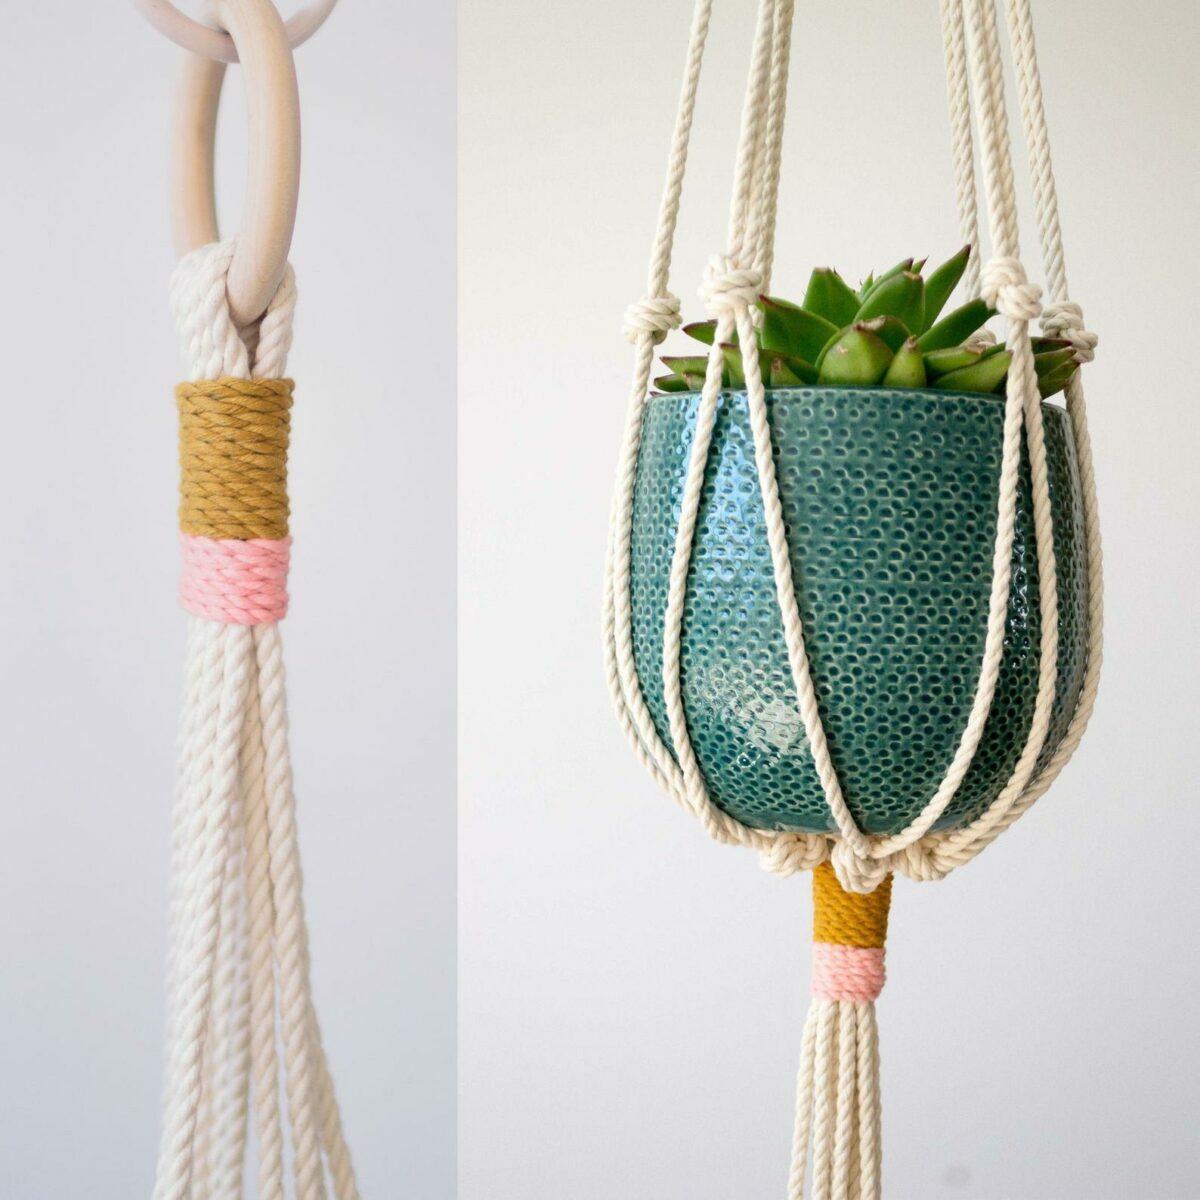 cache-pot corde multicolore minimaliste fait-main artisanal pot suspendu